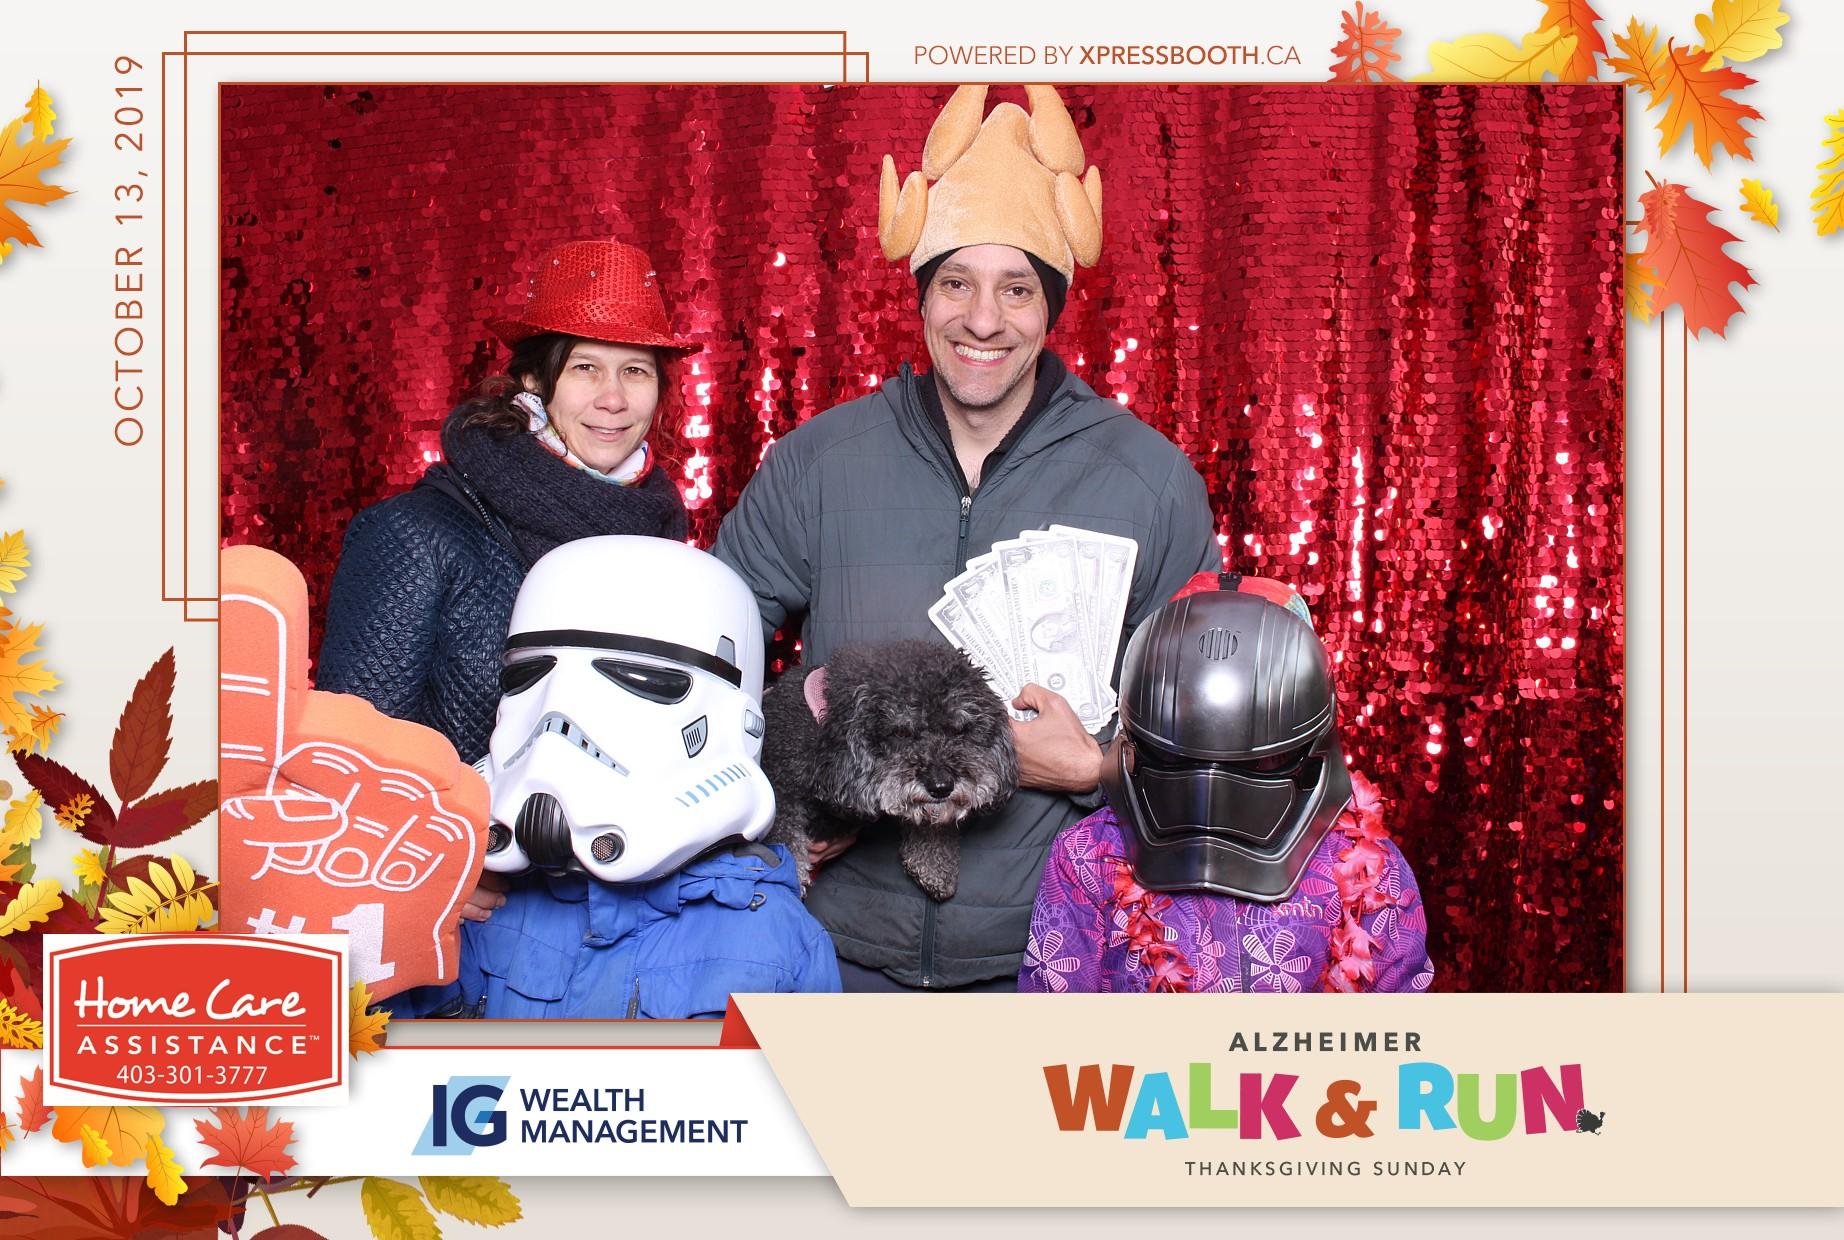 WalkRunAlzheimerSociety-0225-PRINT